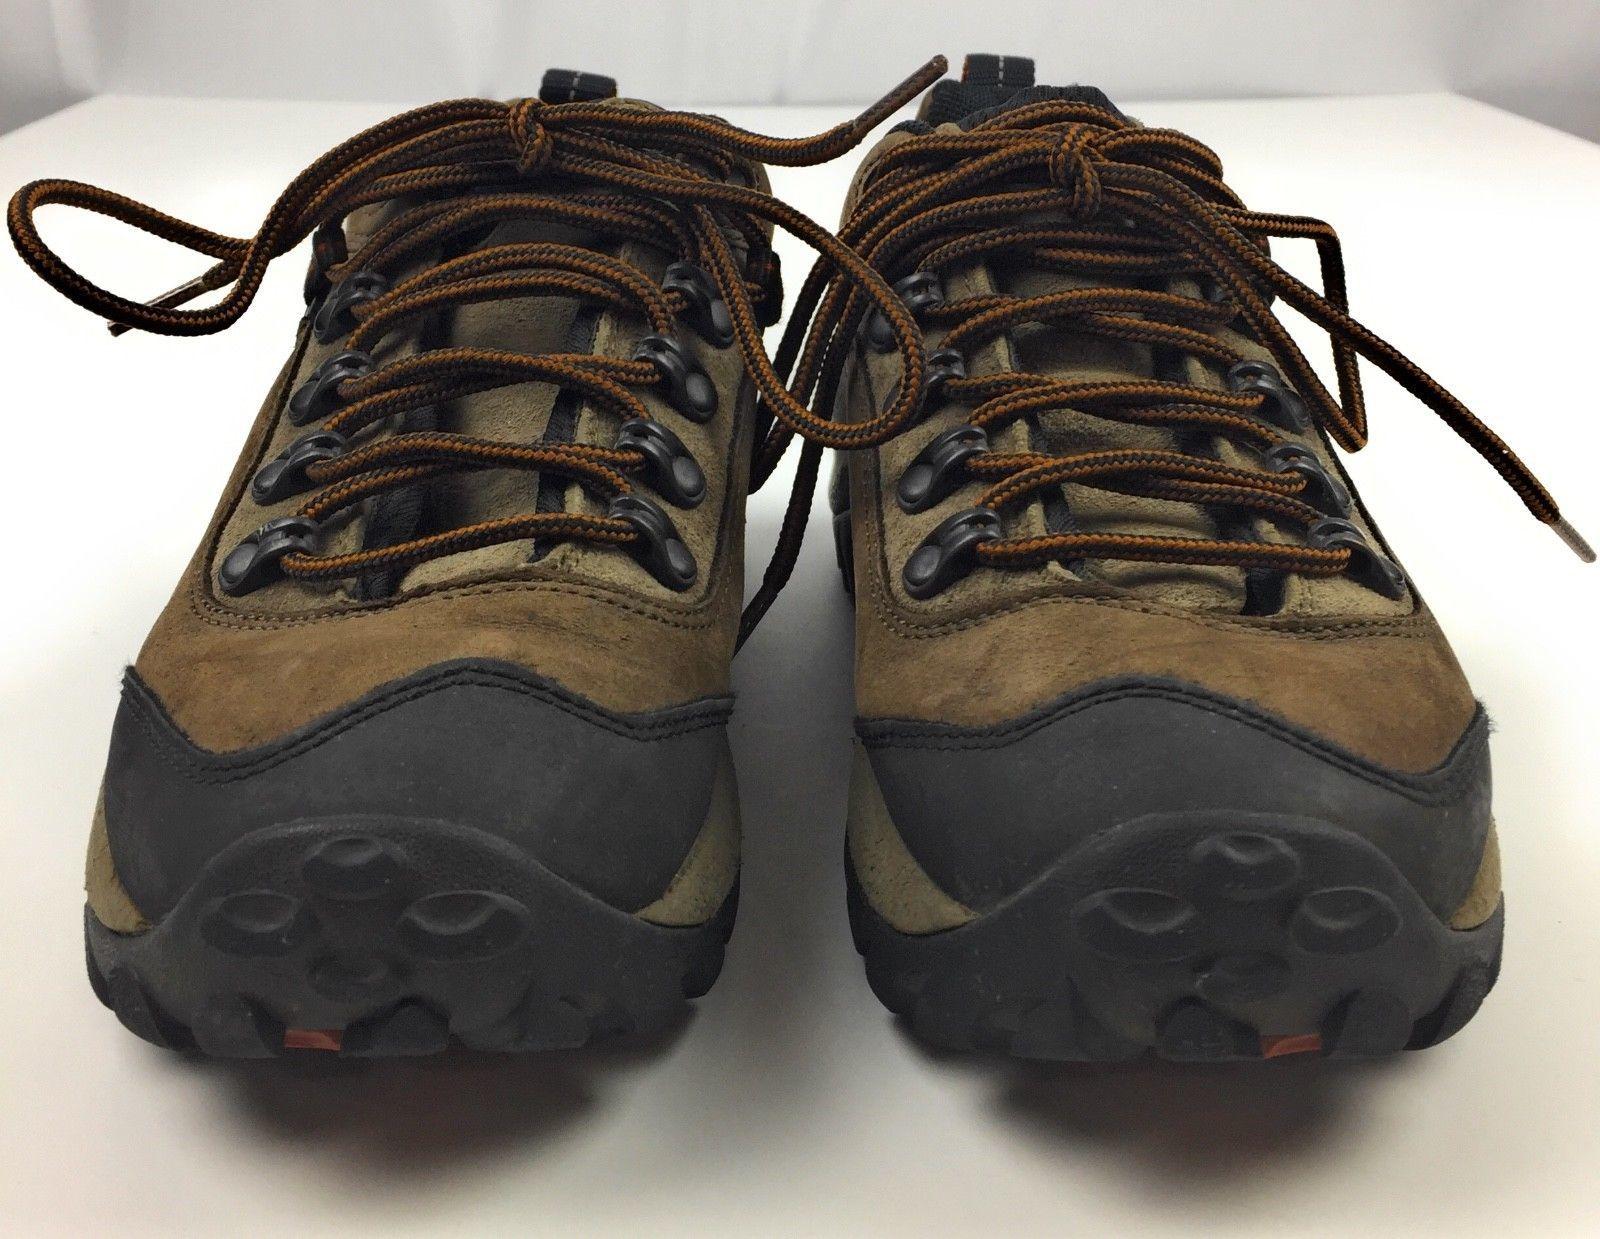 Merrell Phaser Inferno Hiking Trail Shoes Dark Brown Women's 6 US, 3.5 UK 36 EUR